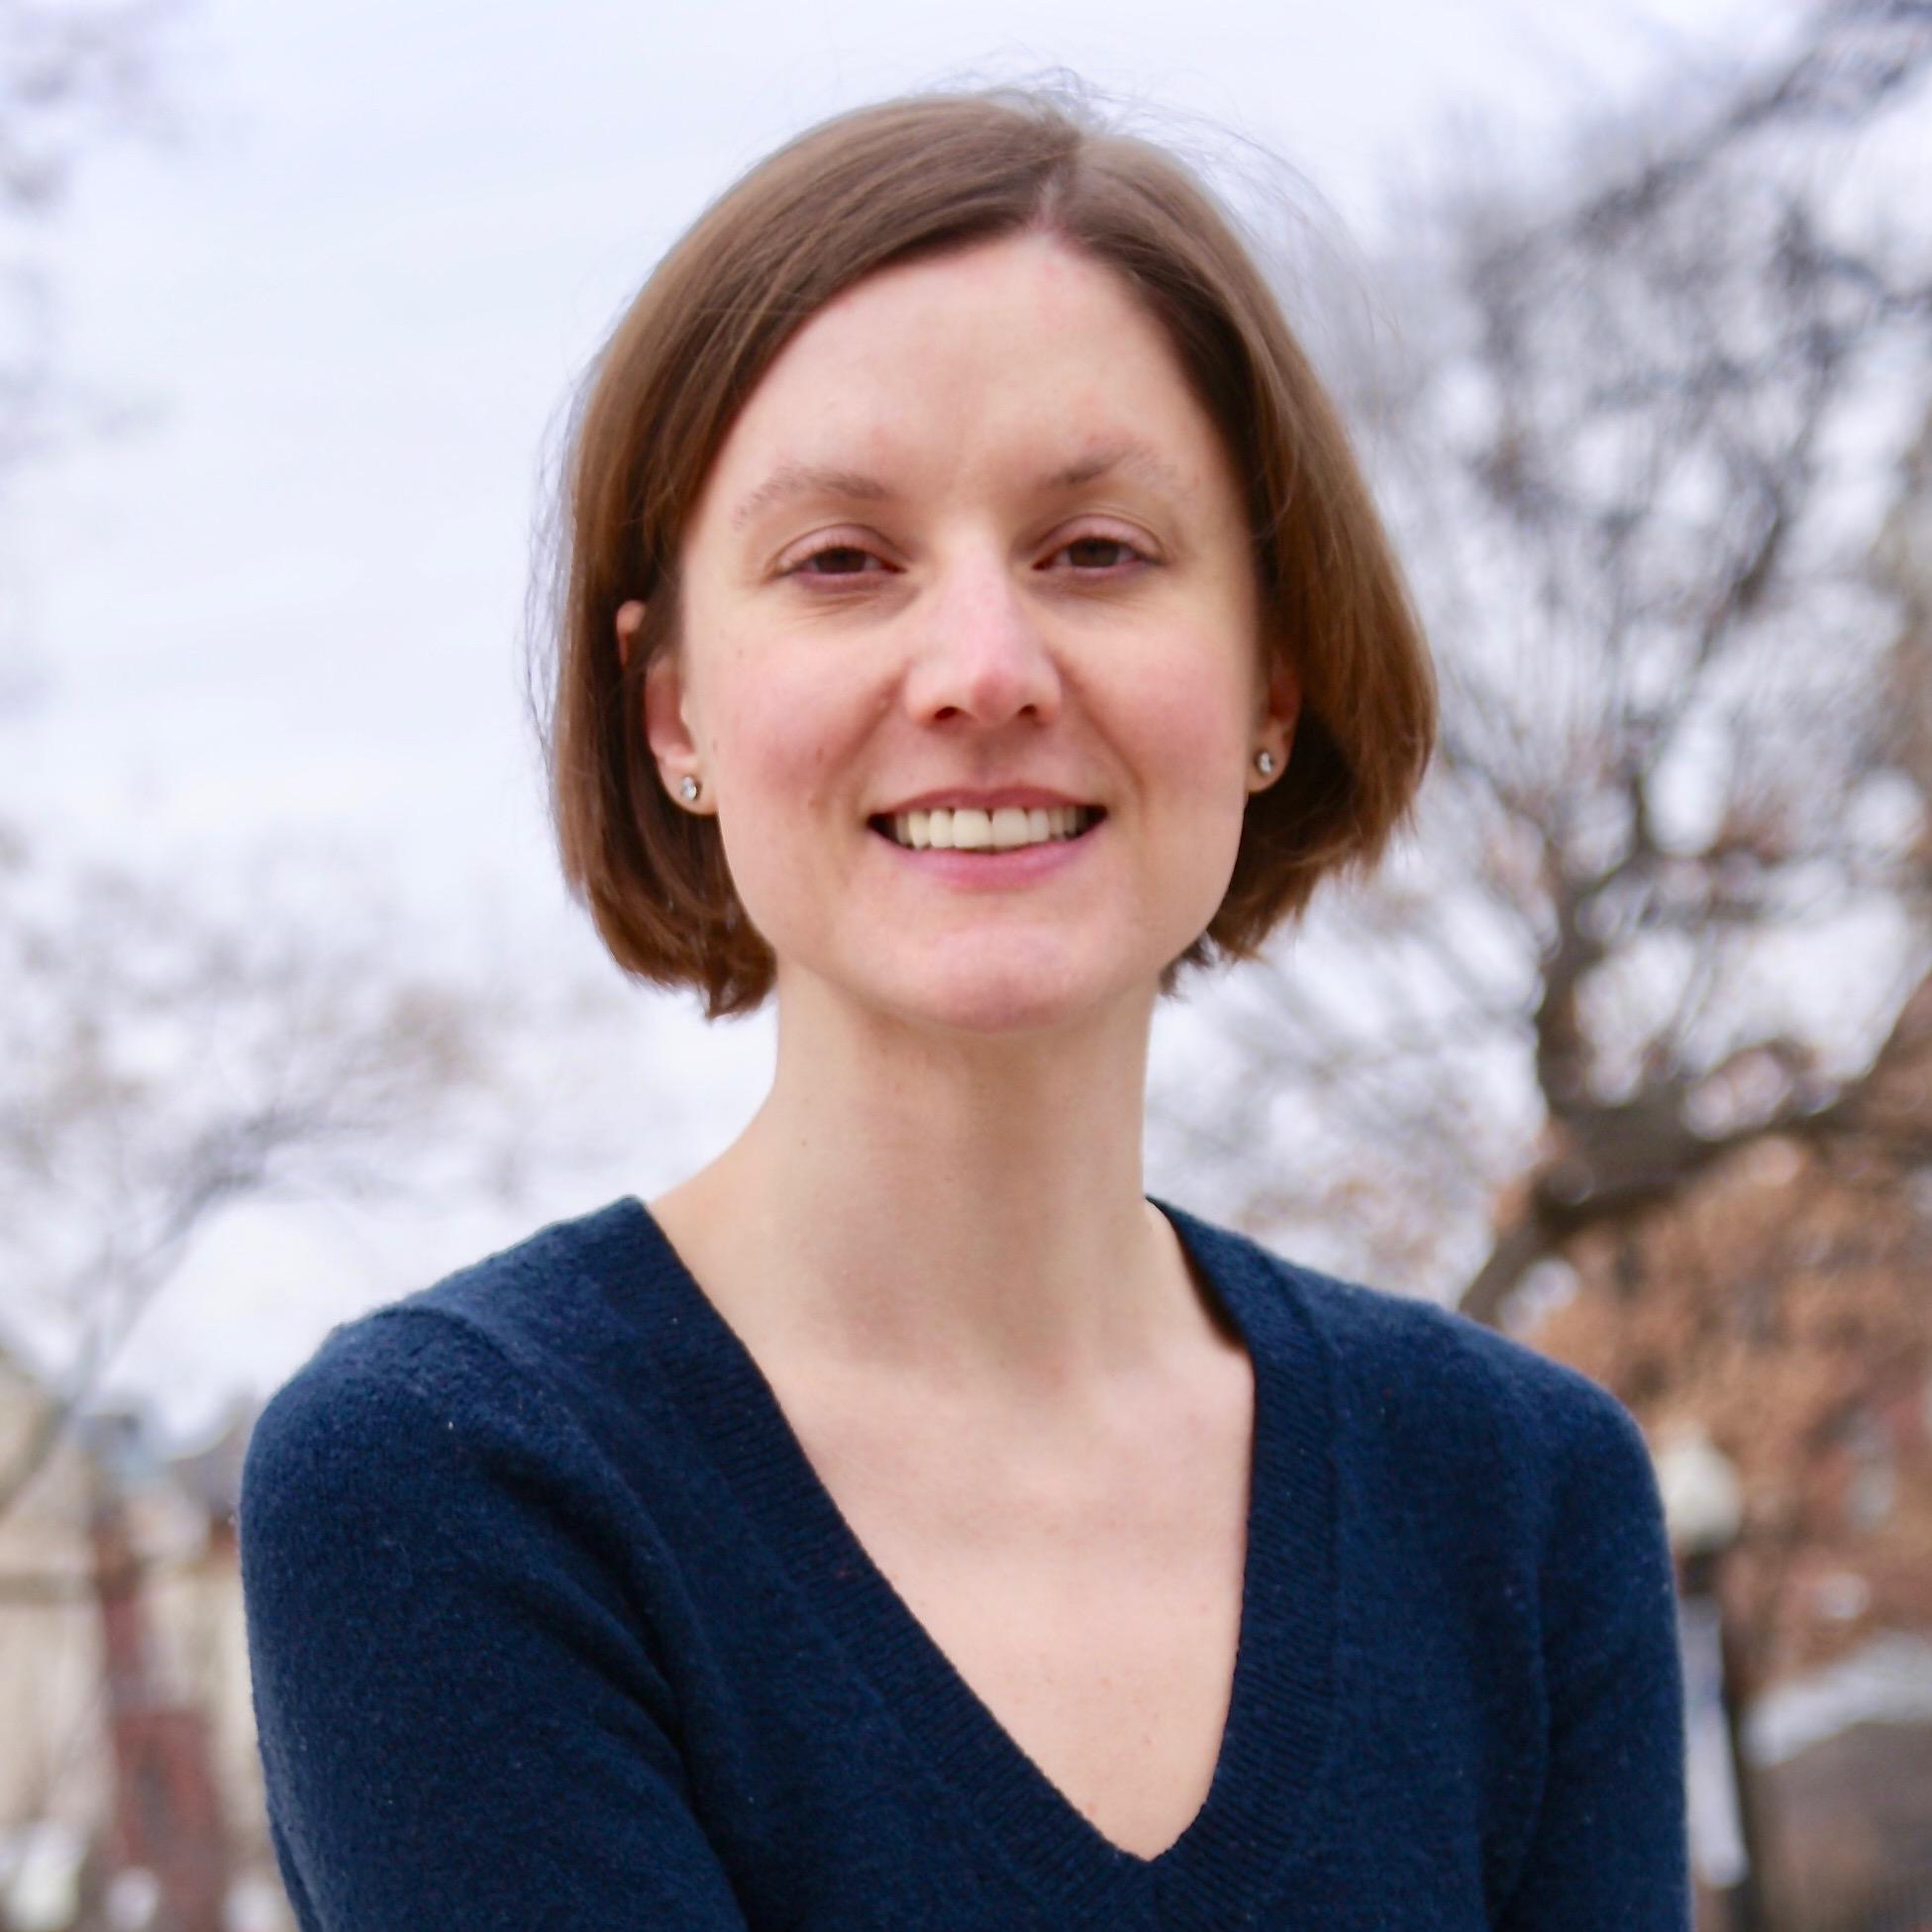 Jennifer Anne | Reporter, Artist, Yoga Instructor, and BEACON Spark